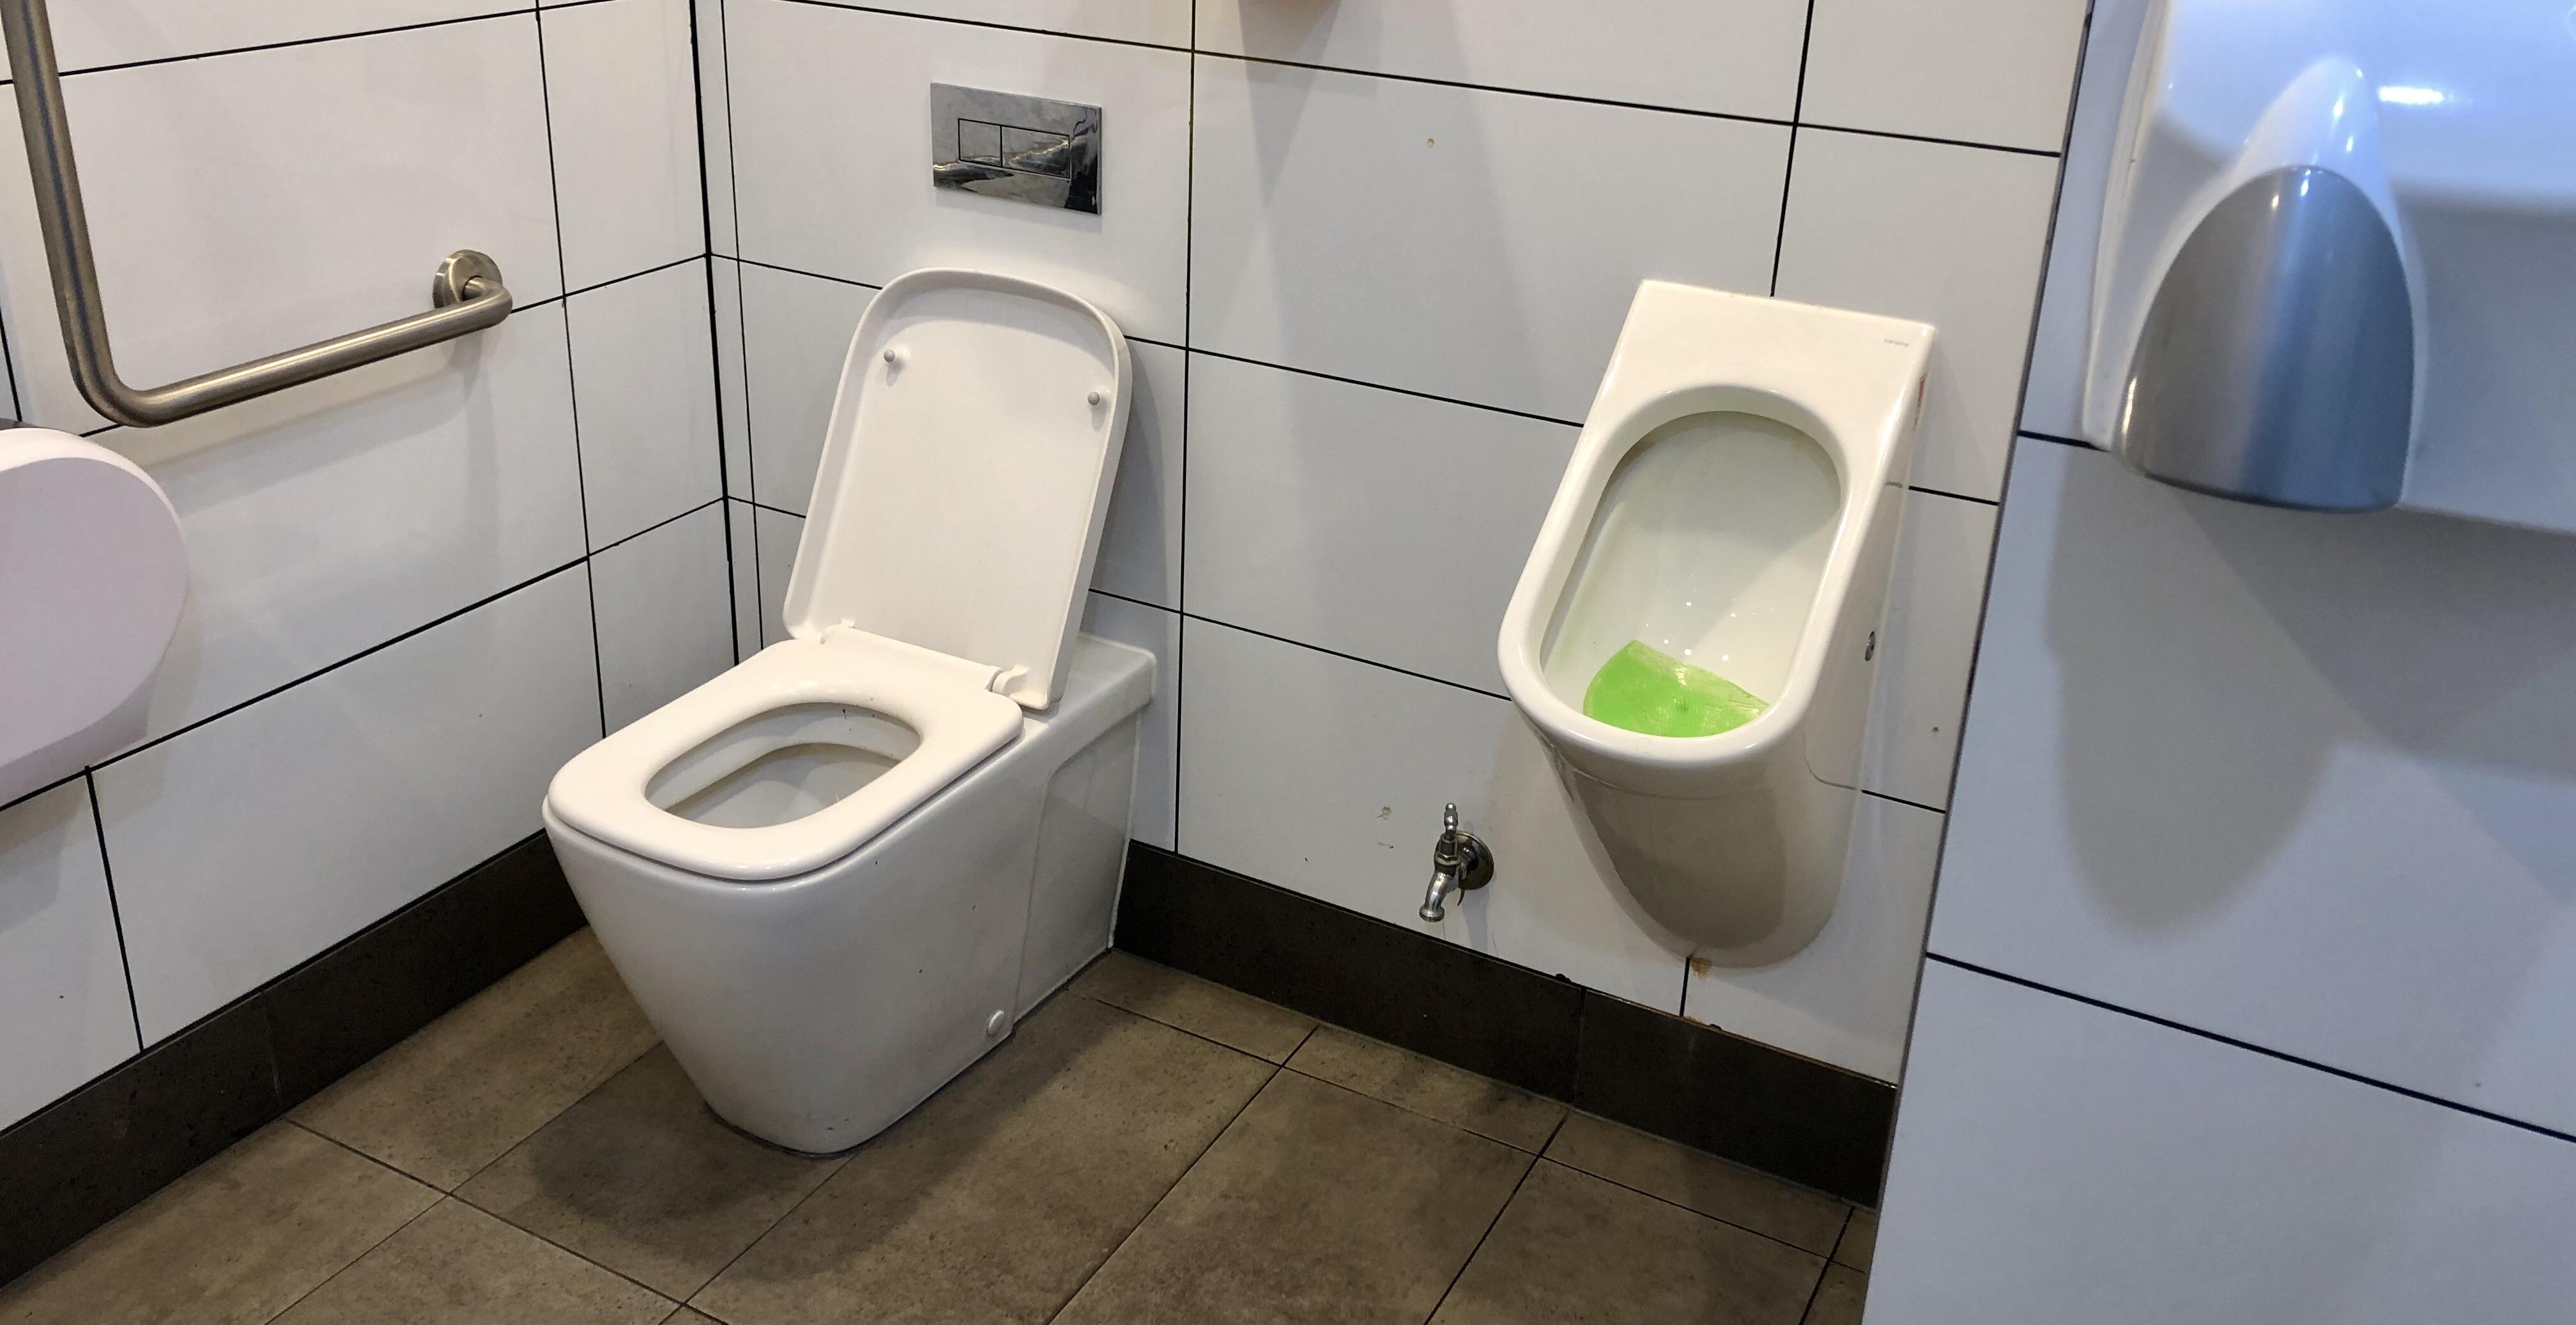 Local Kfc Bathroom Layout Confuses Patrons The Watsonia Bugle